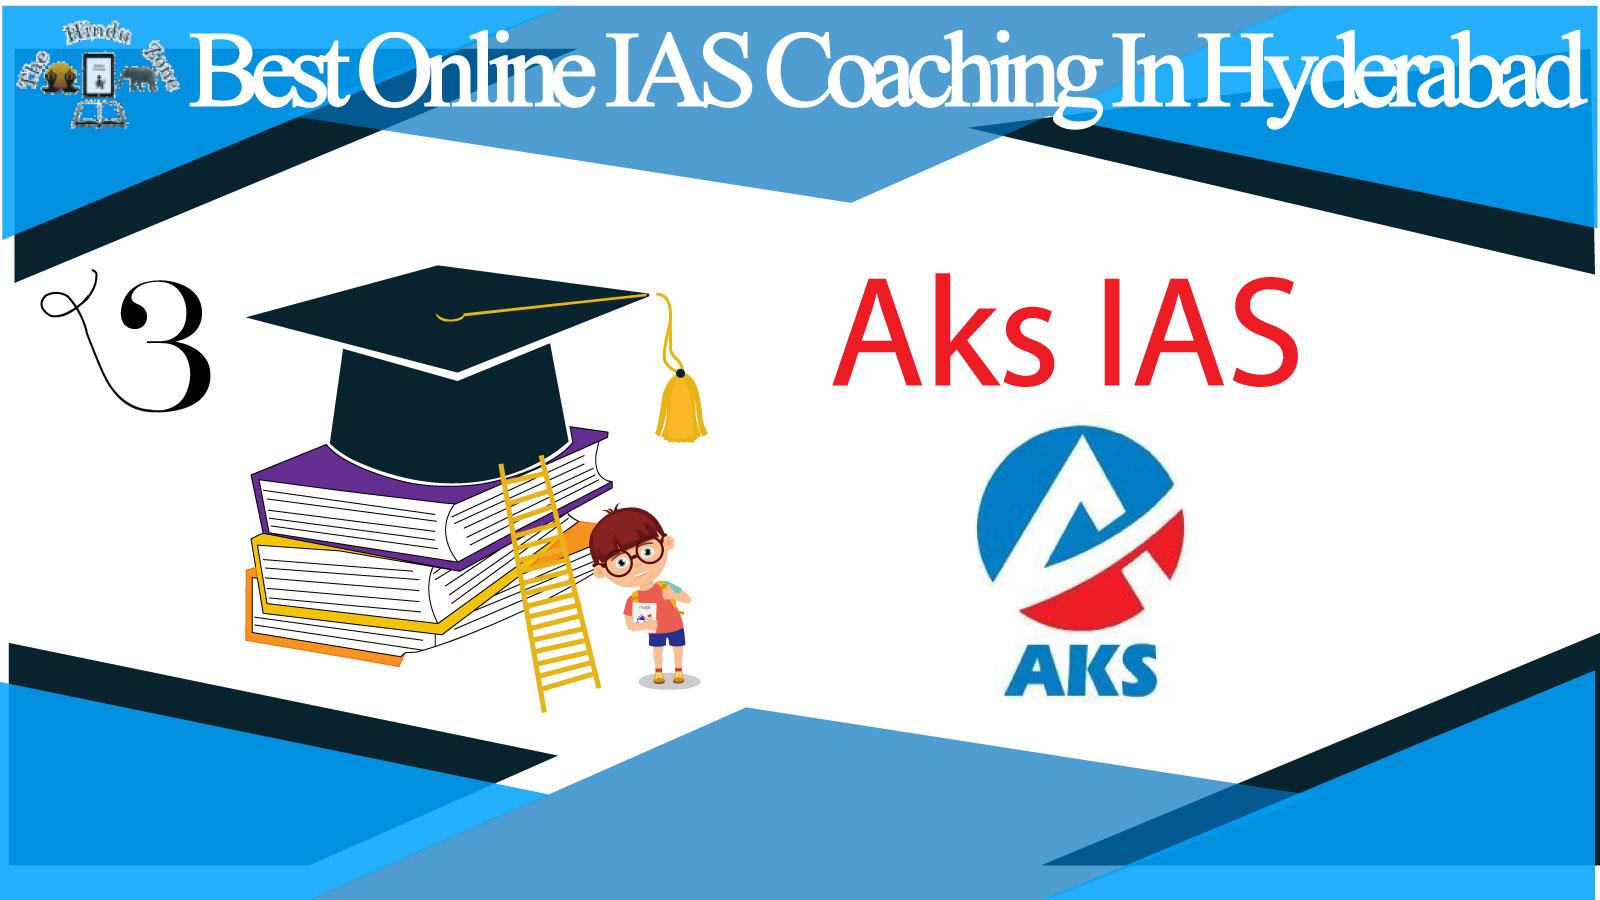 Aks IAS Online Coaching in Hyderabad